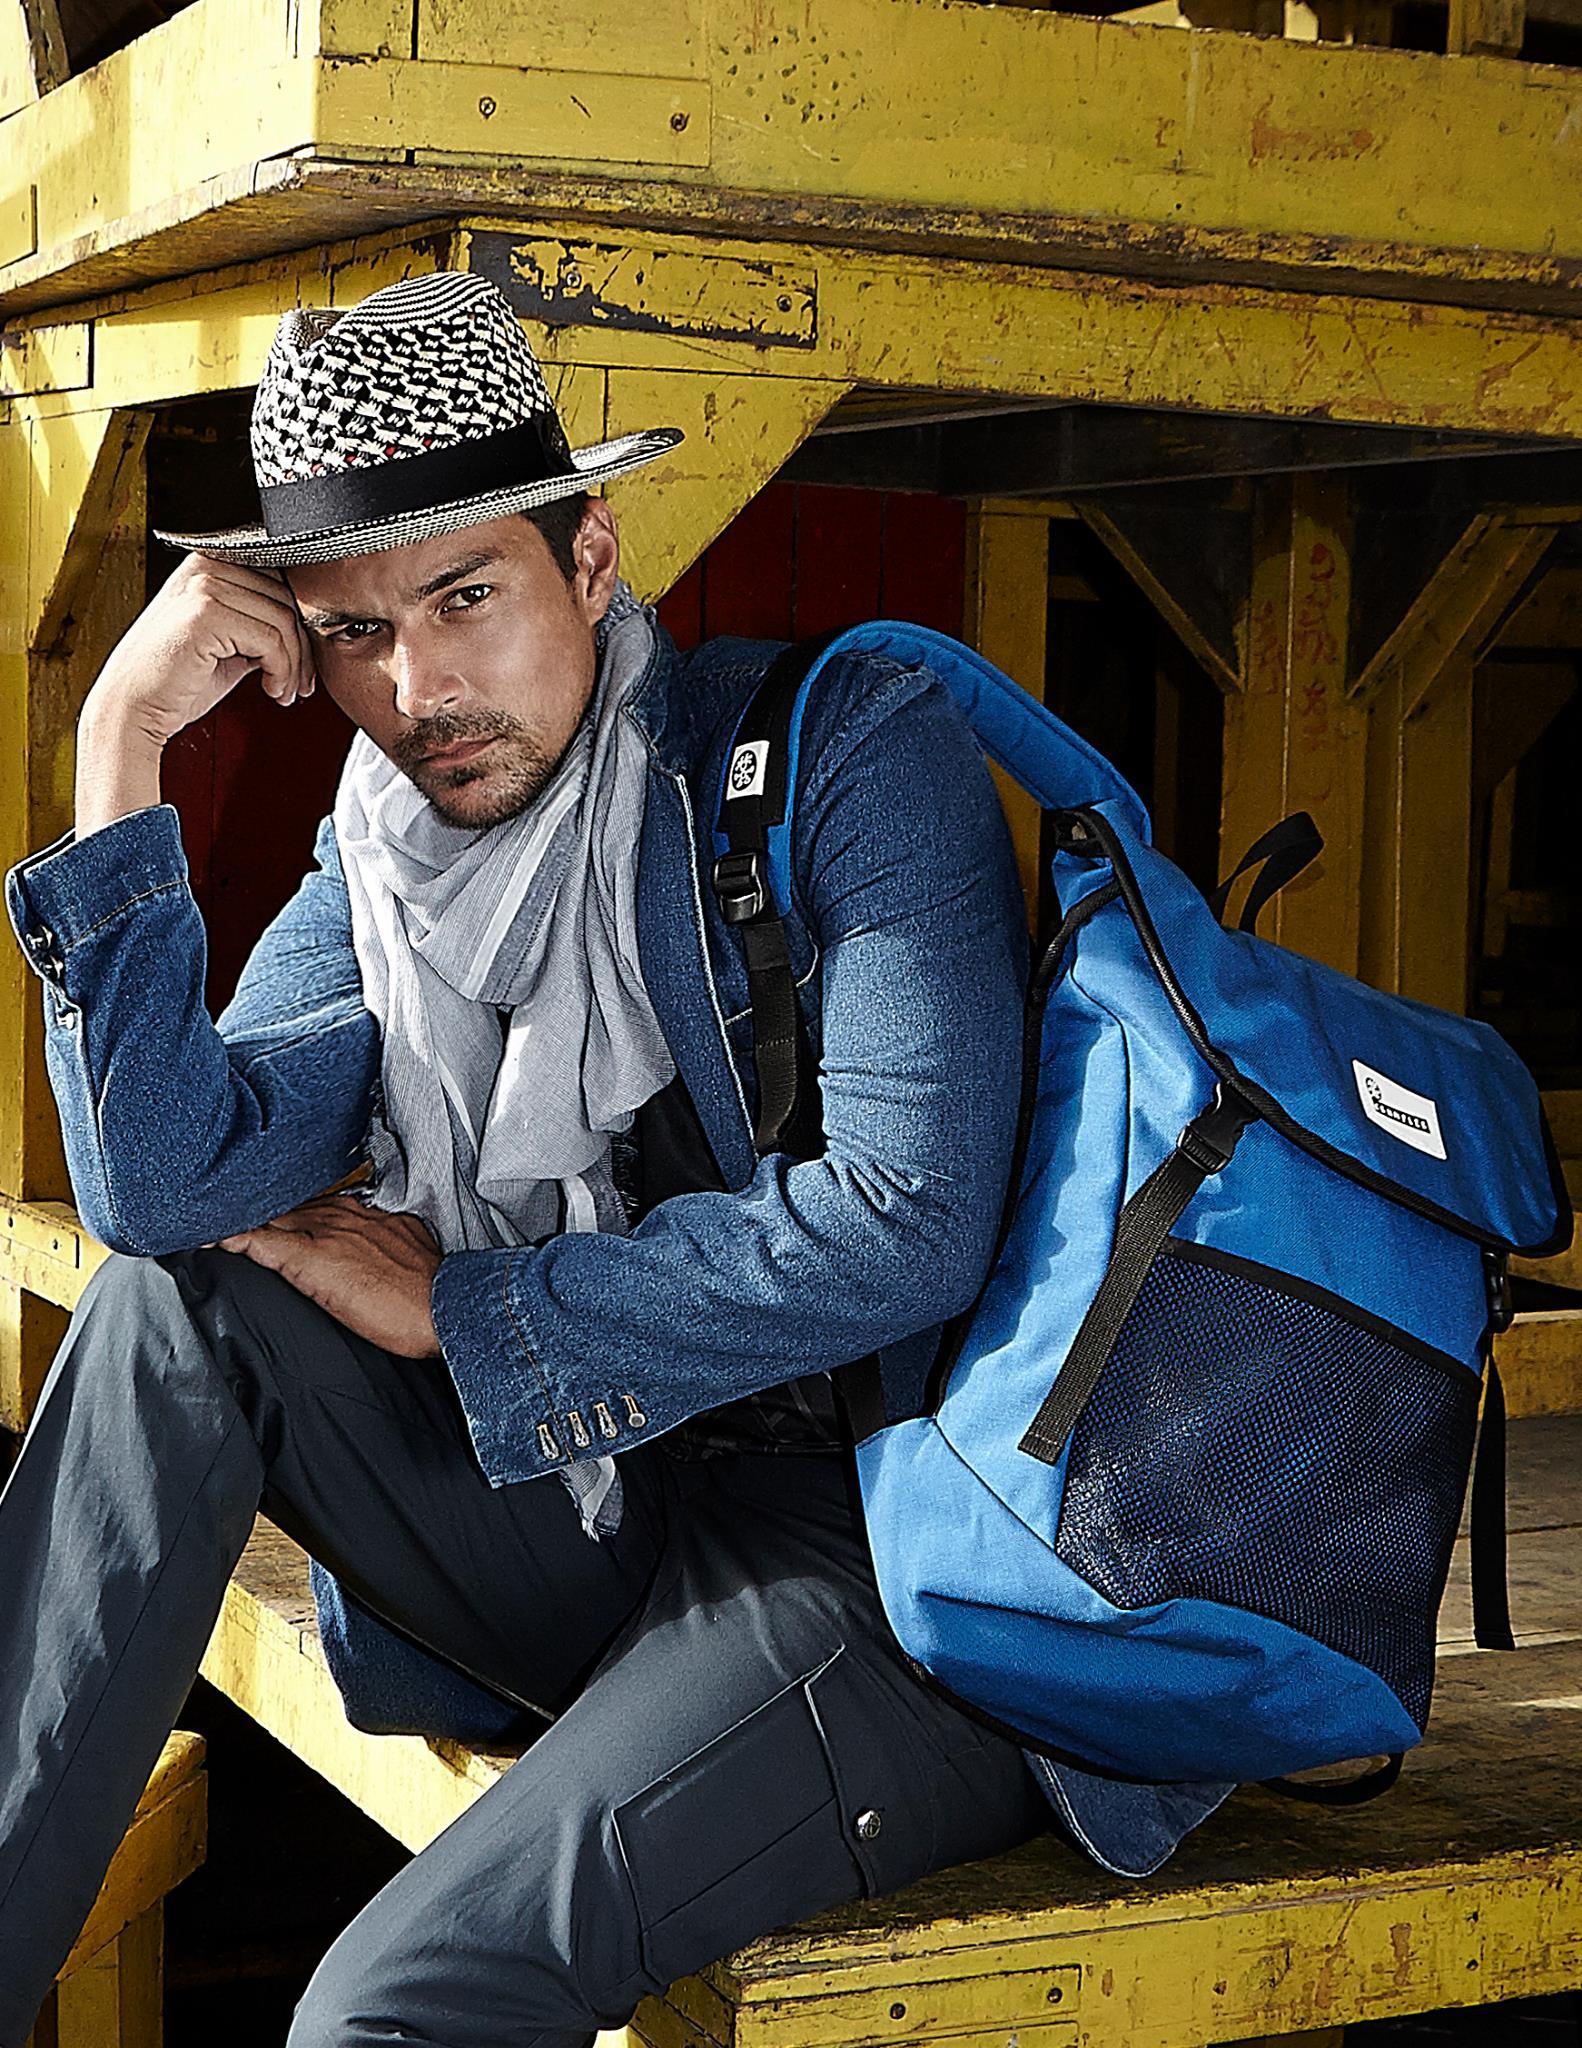 Jacket: Playhound / Pants: Vick's /Bag : Crumpler / hat: Spotted